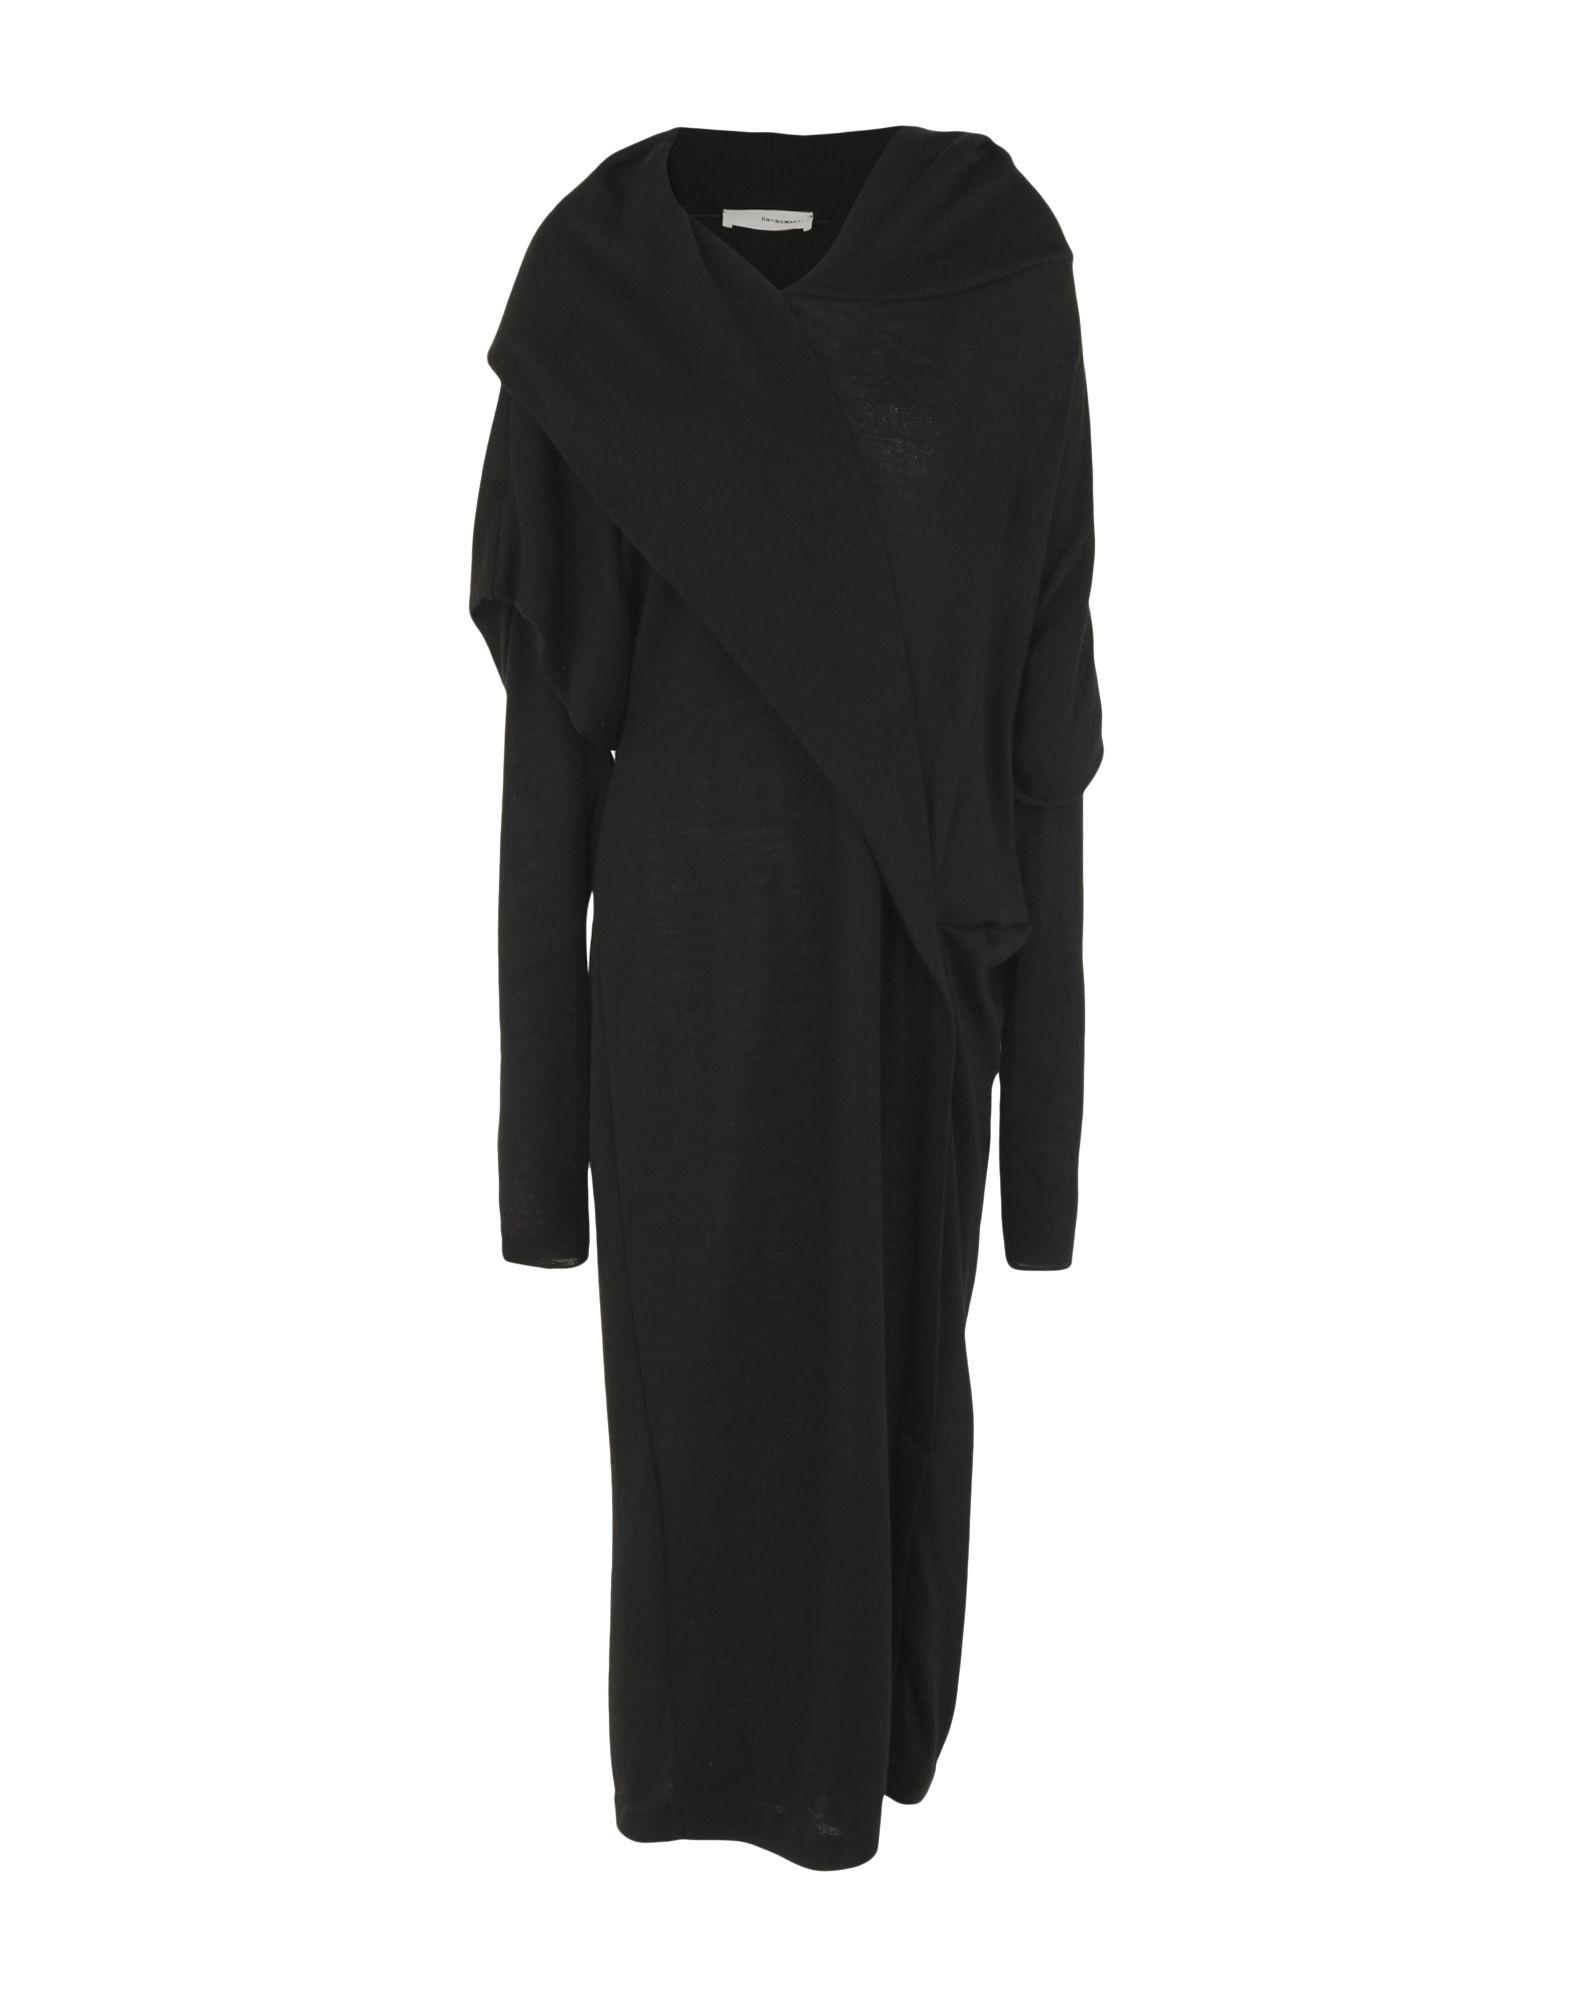 UN-NAMABLE Платье длиной 3/4 reveur rich